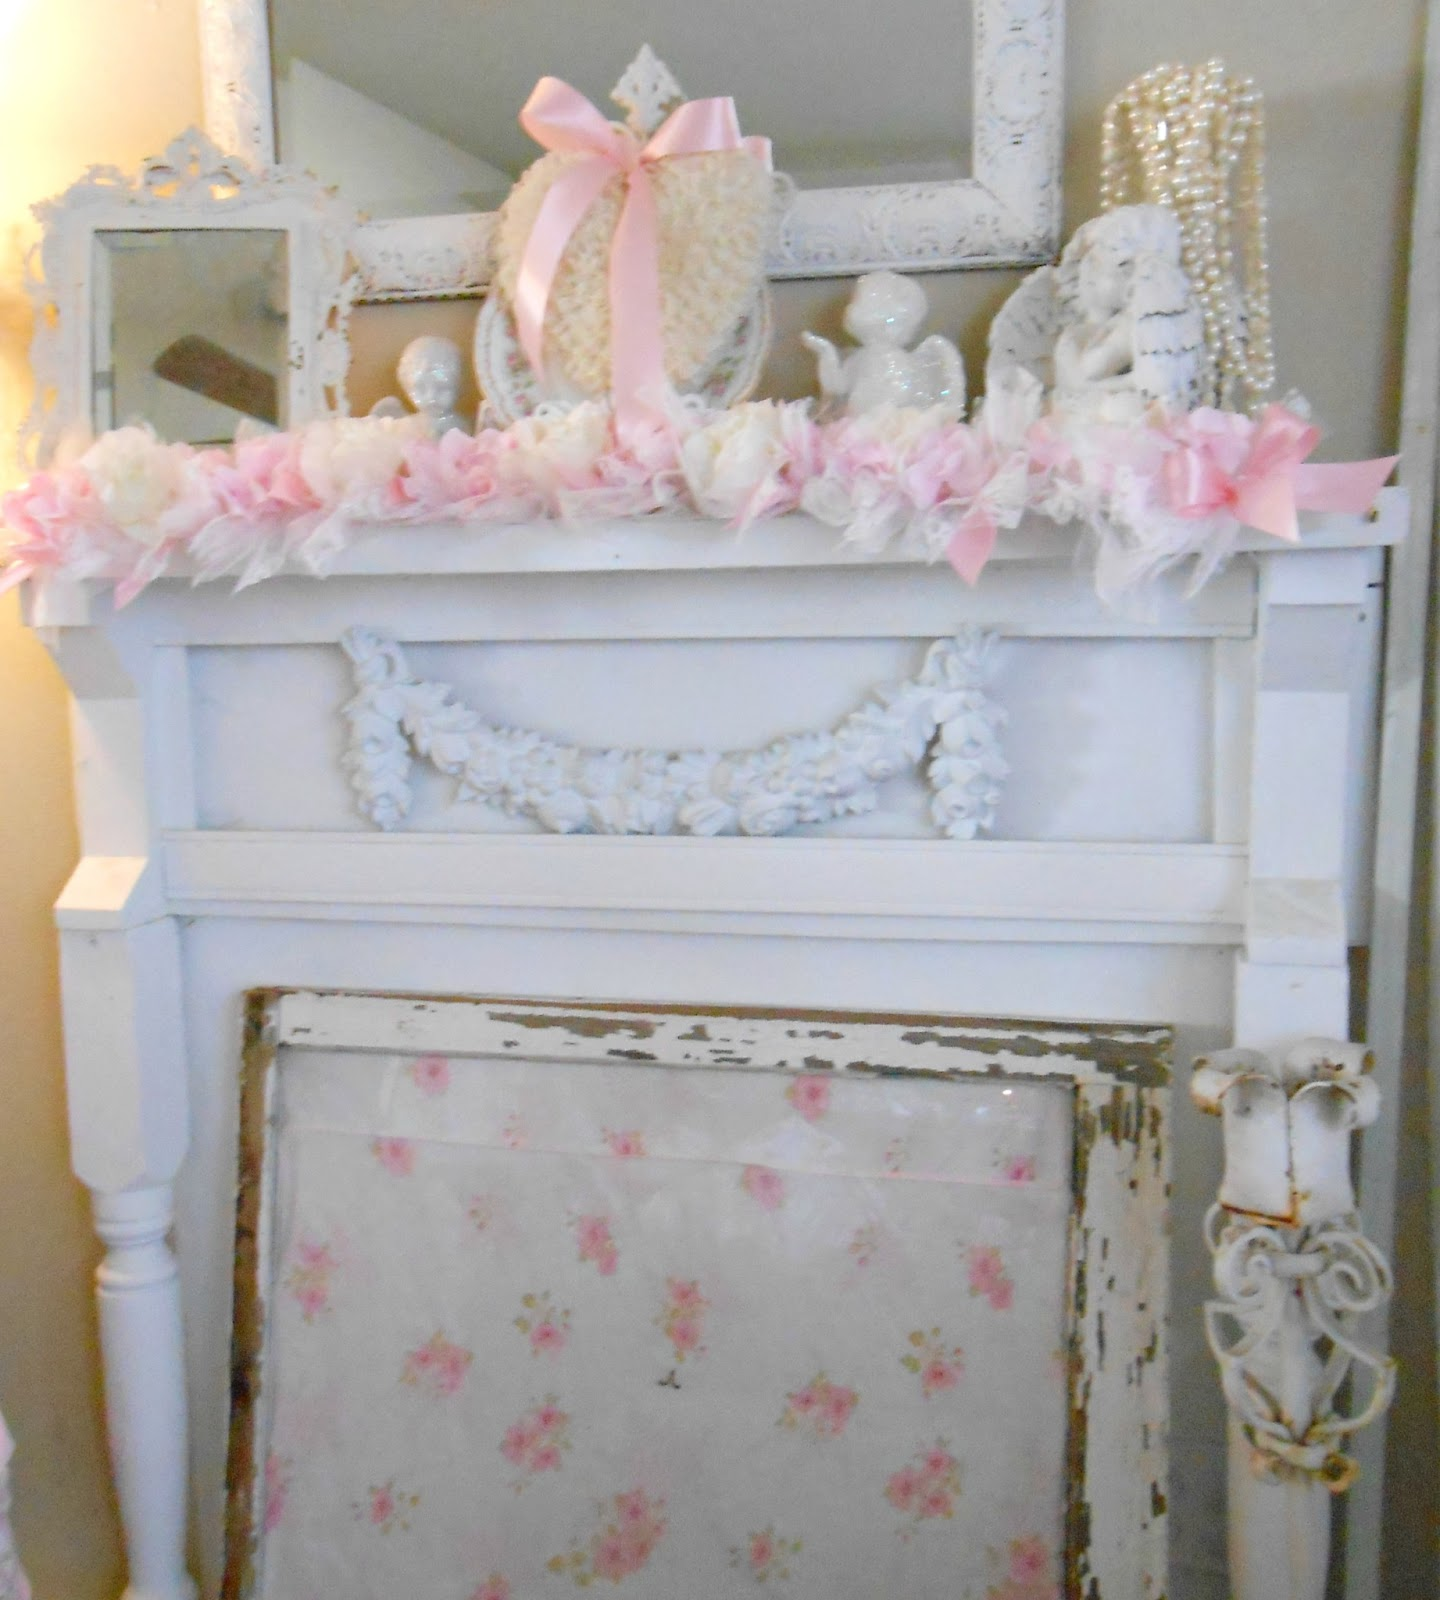 Olivia's Romantic Home: Valentines Mantel